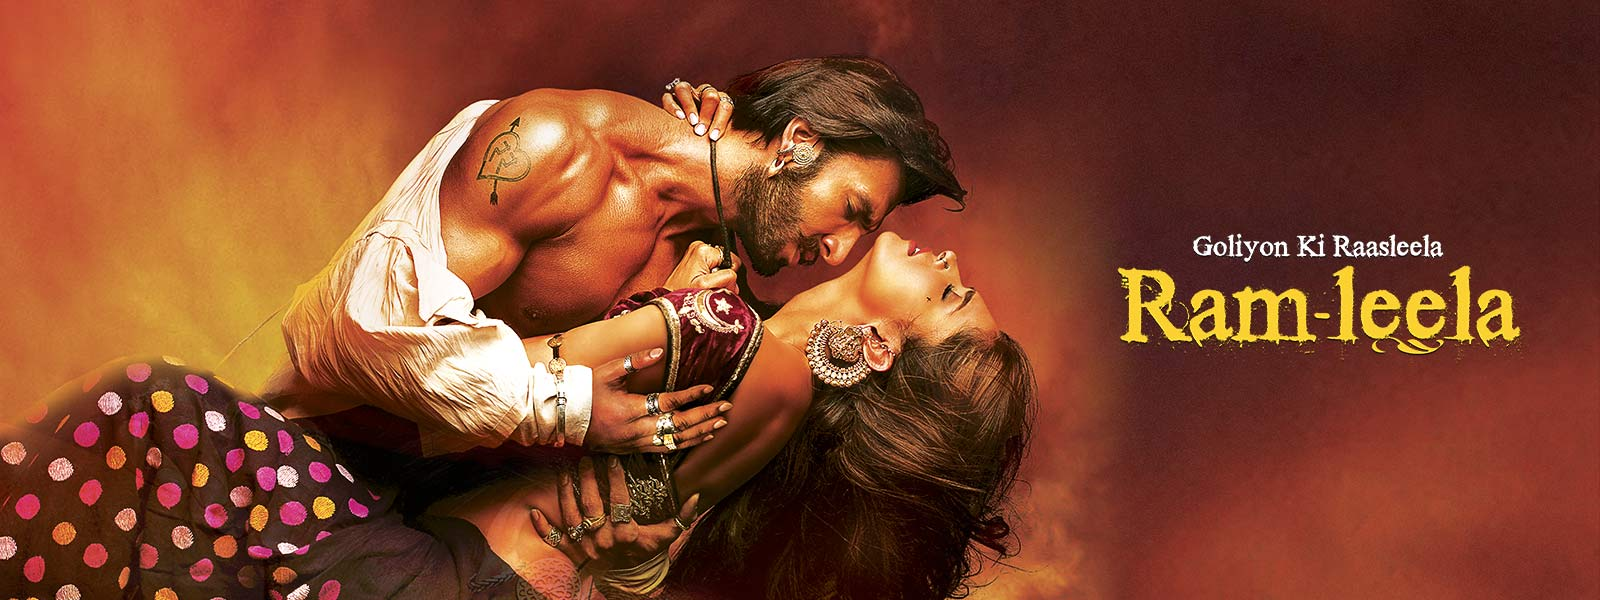 Goliyon Ki Raasleela Ram Leela Watch Full Movie Online Eros Now